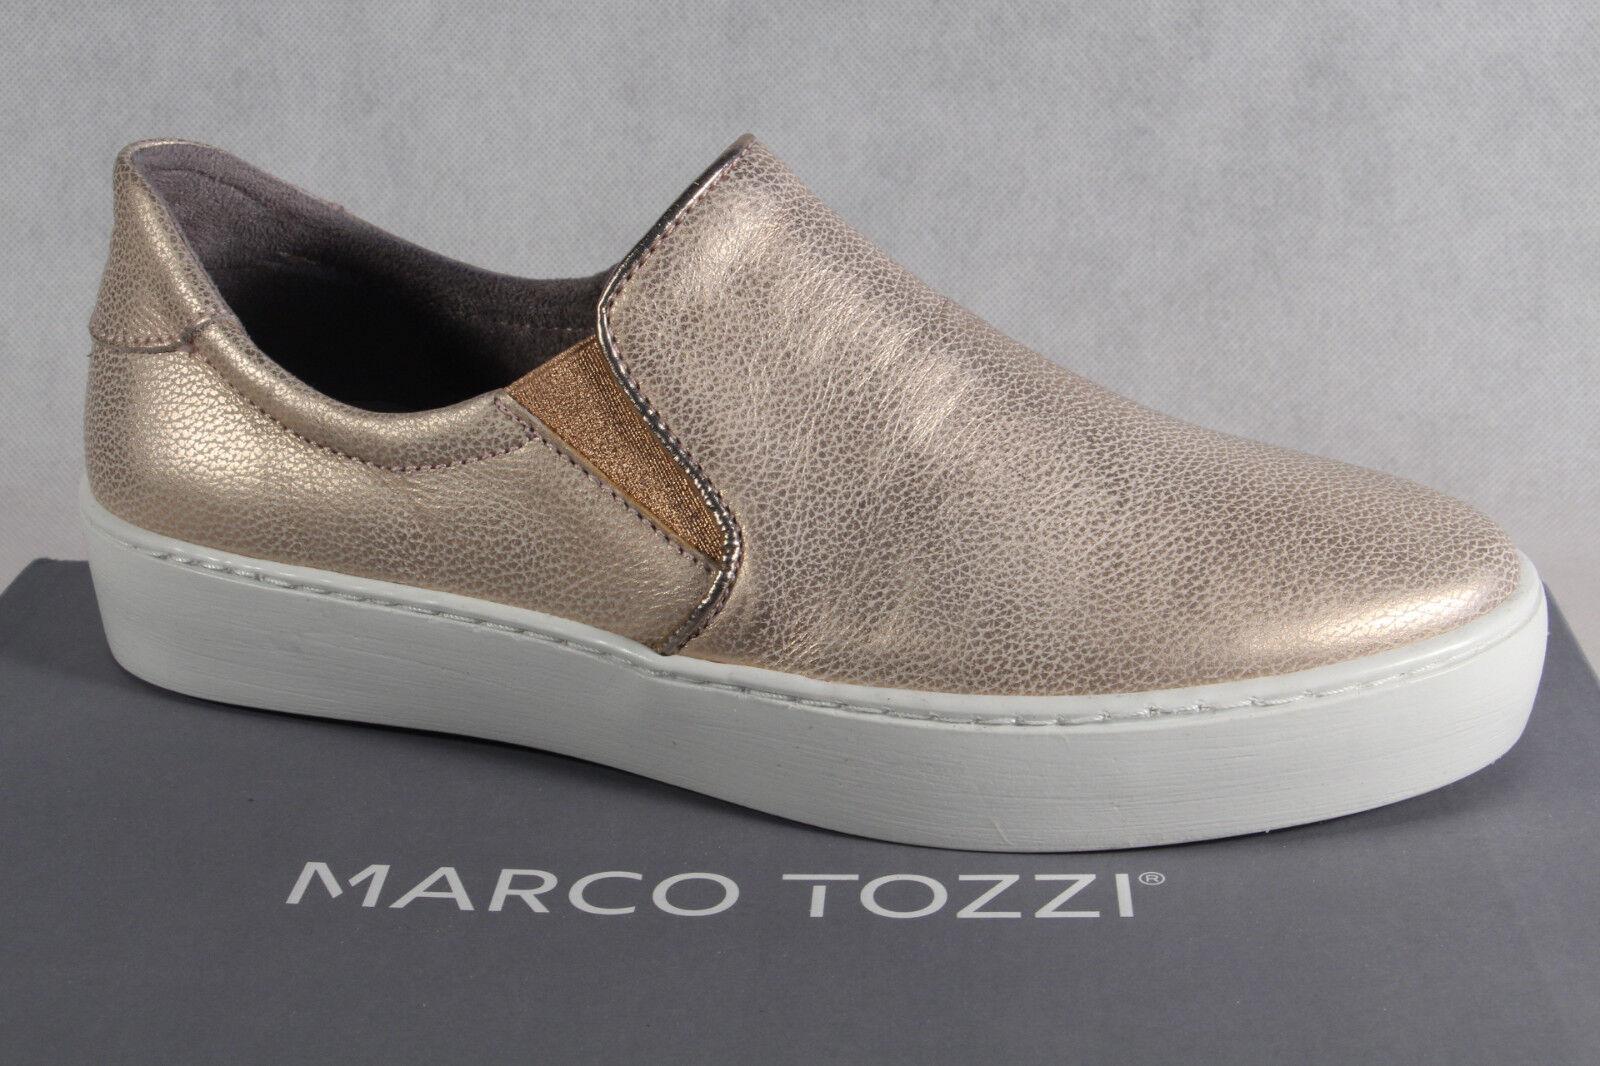 Marco Tozzi Ballerinas Slipper Halbschuhe Pumps Rosa NEU